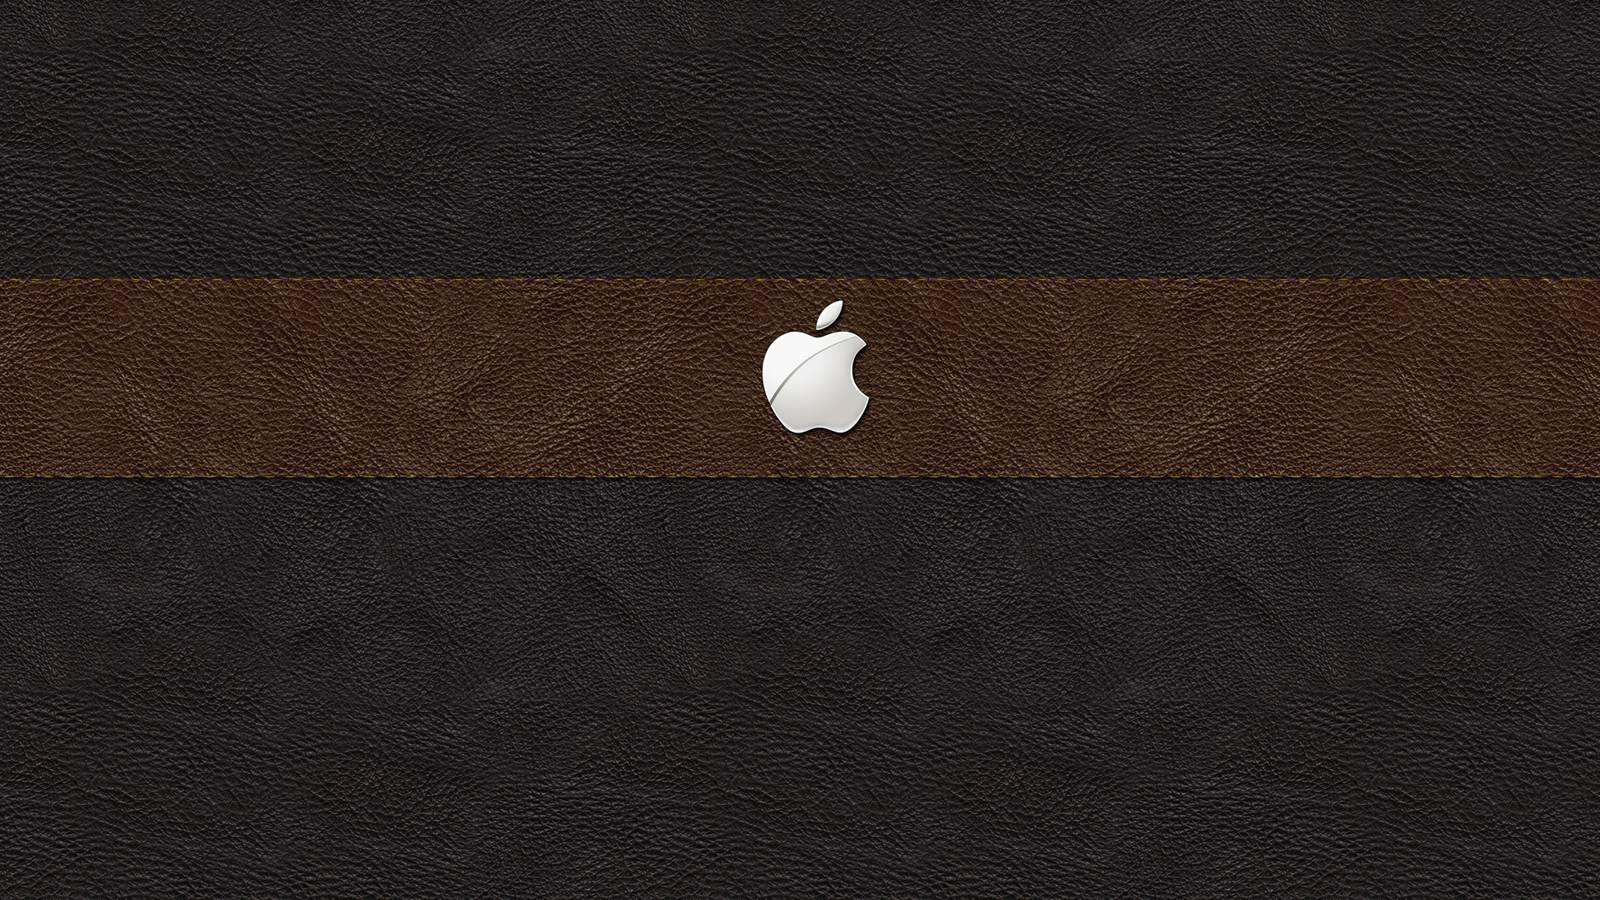 Black Leather HD desktop wallpaper : High Definition 1600900